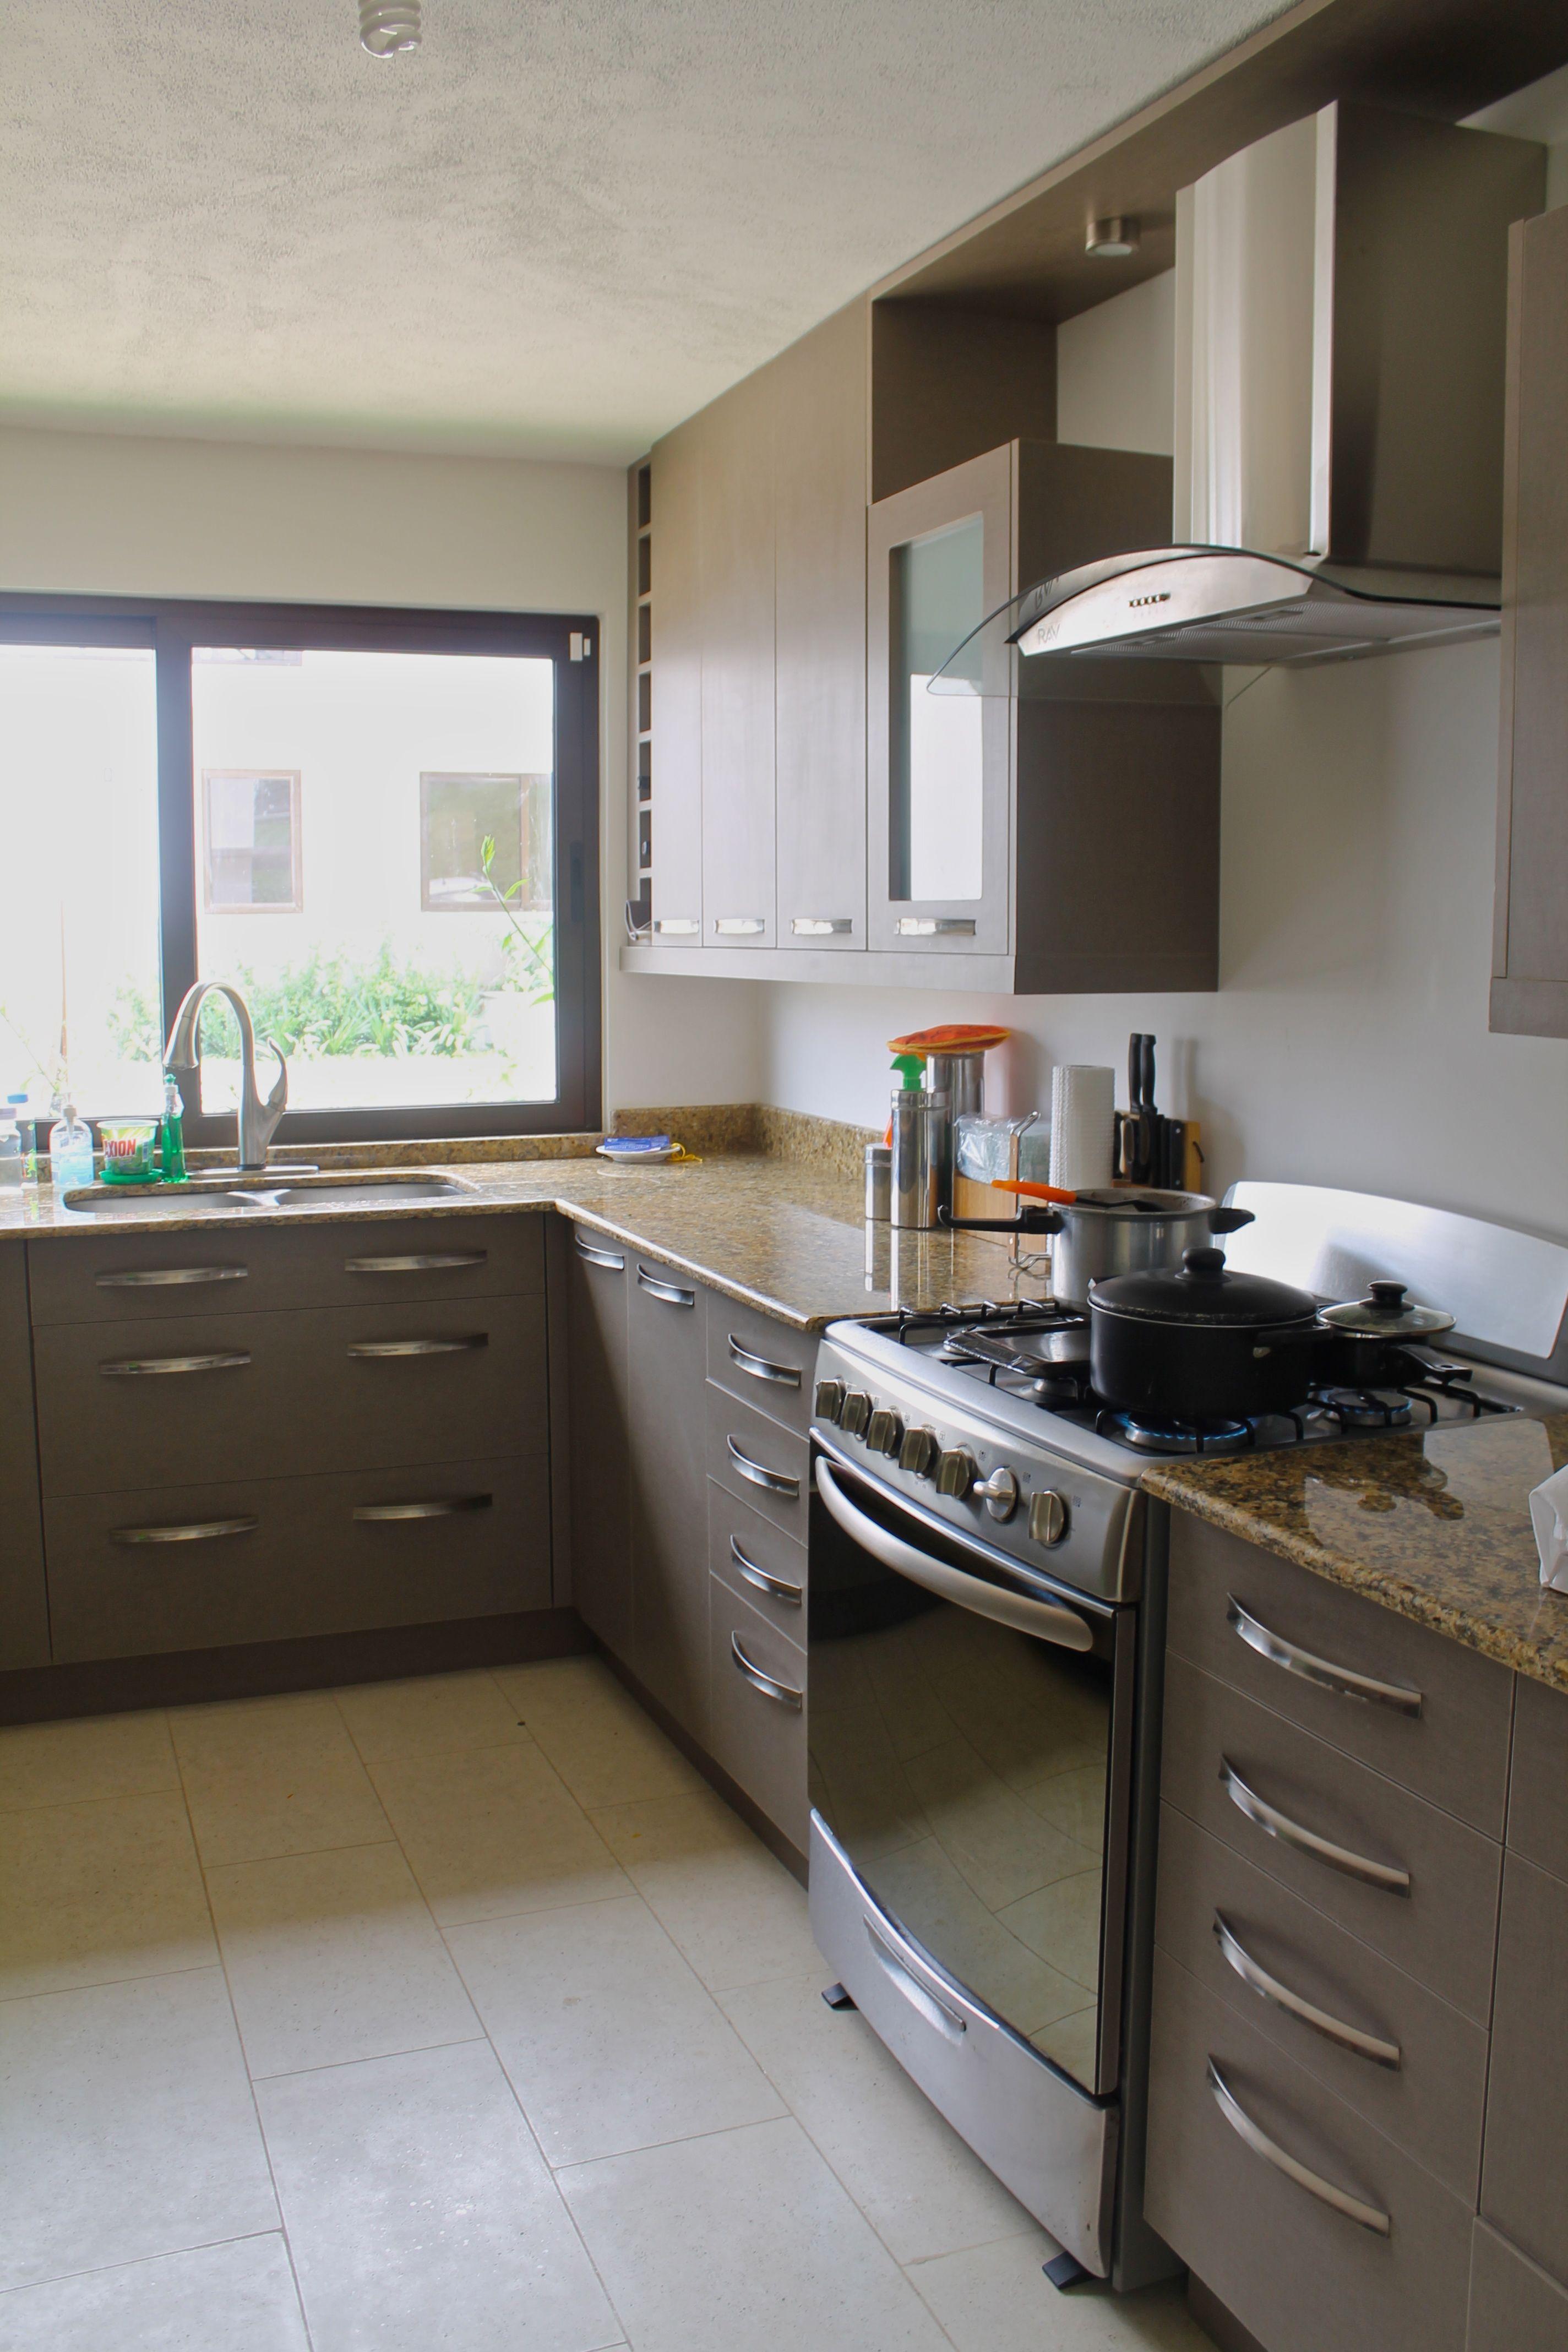 Cocina textil capuccino con granito amarillo santa cecilia for Ver disenos de cocinas pequenas